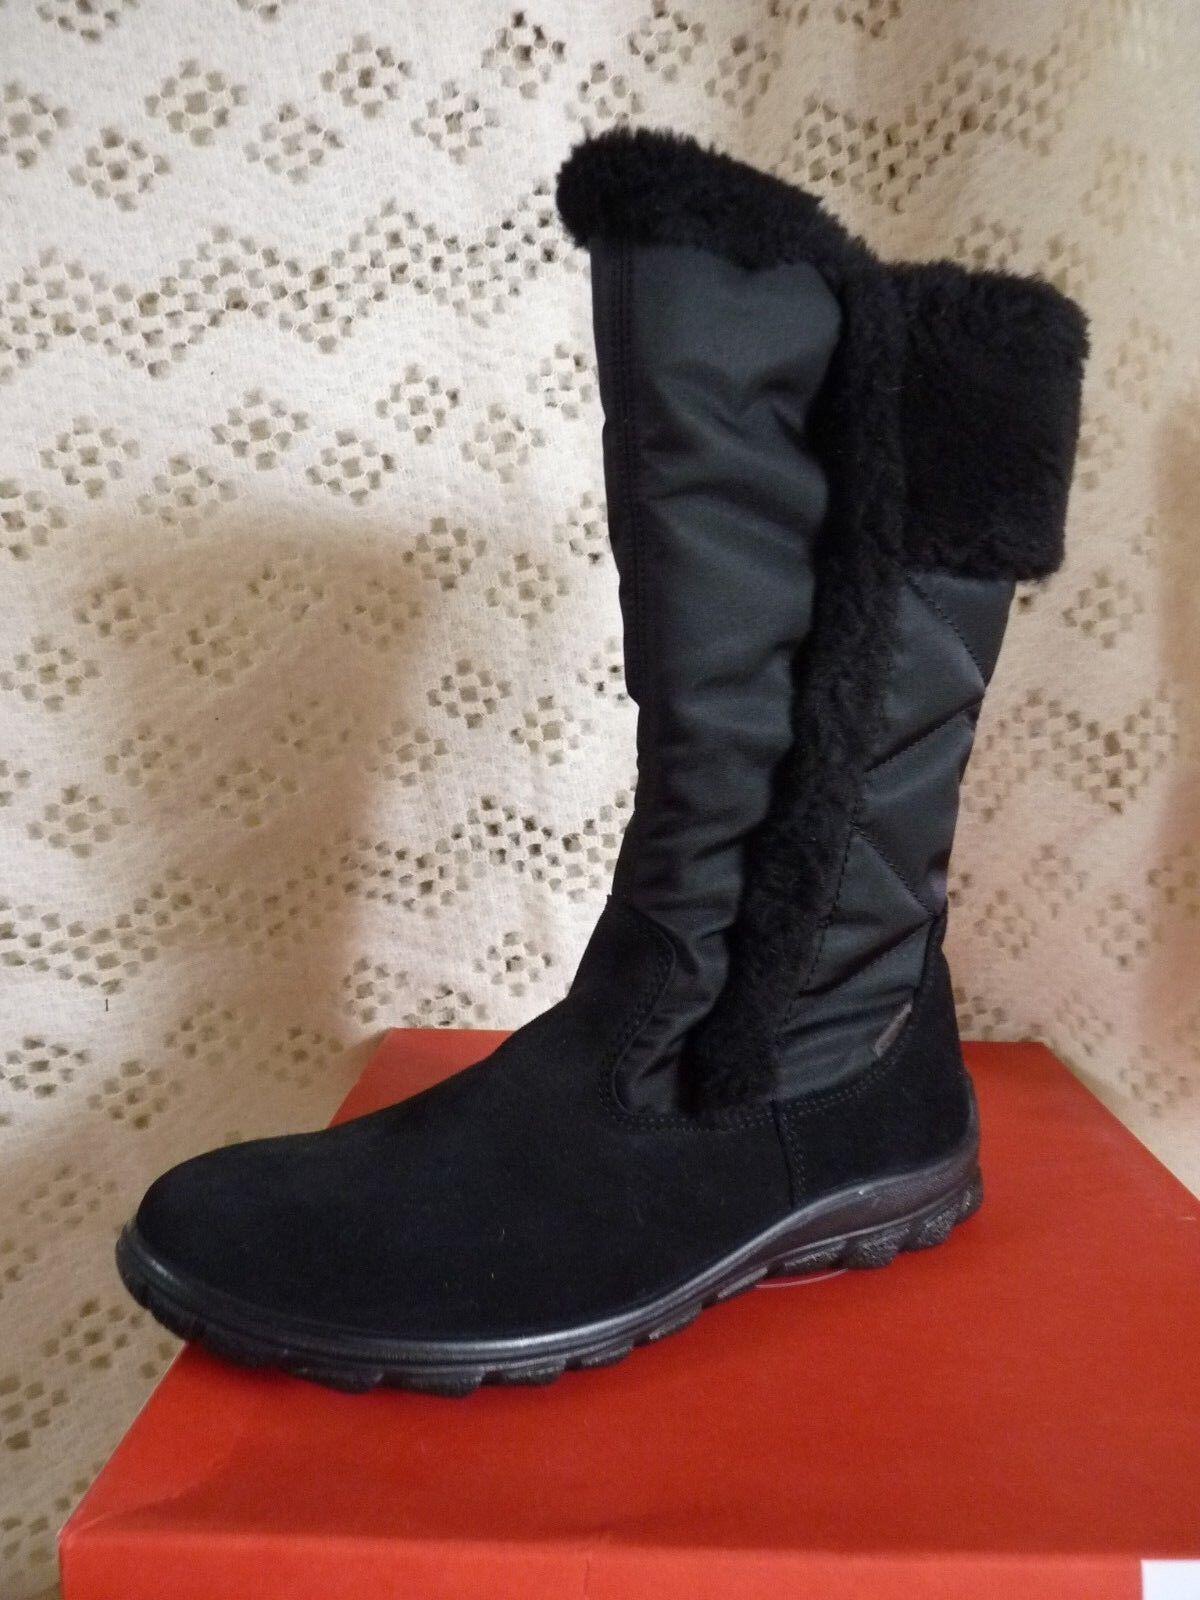 Mesdames RICOSTA Hayley Neige Bottes Hiver Noir Taille UK6.5 EU 40